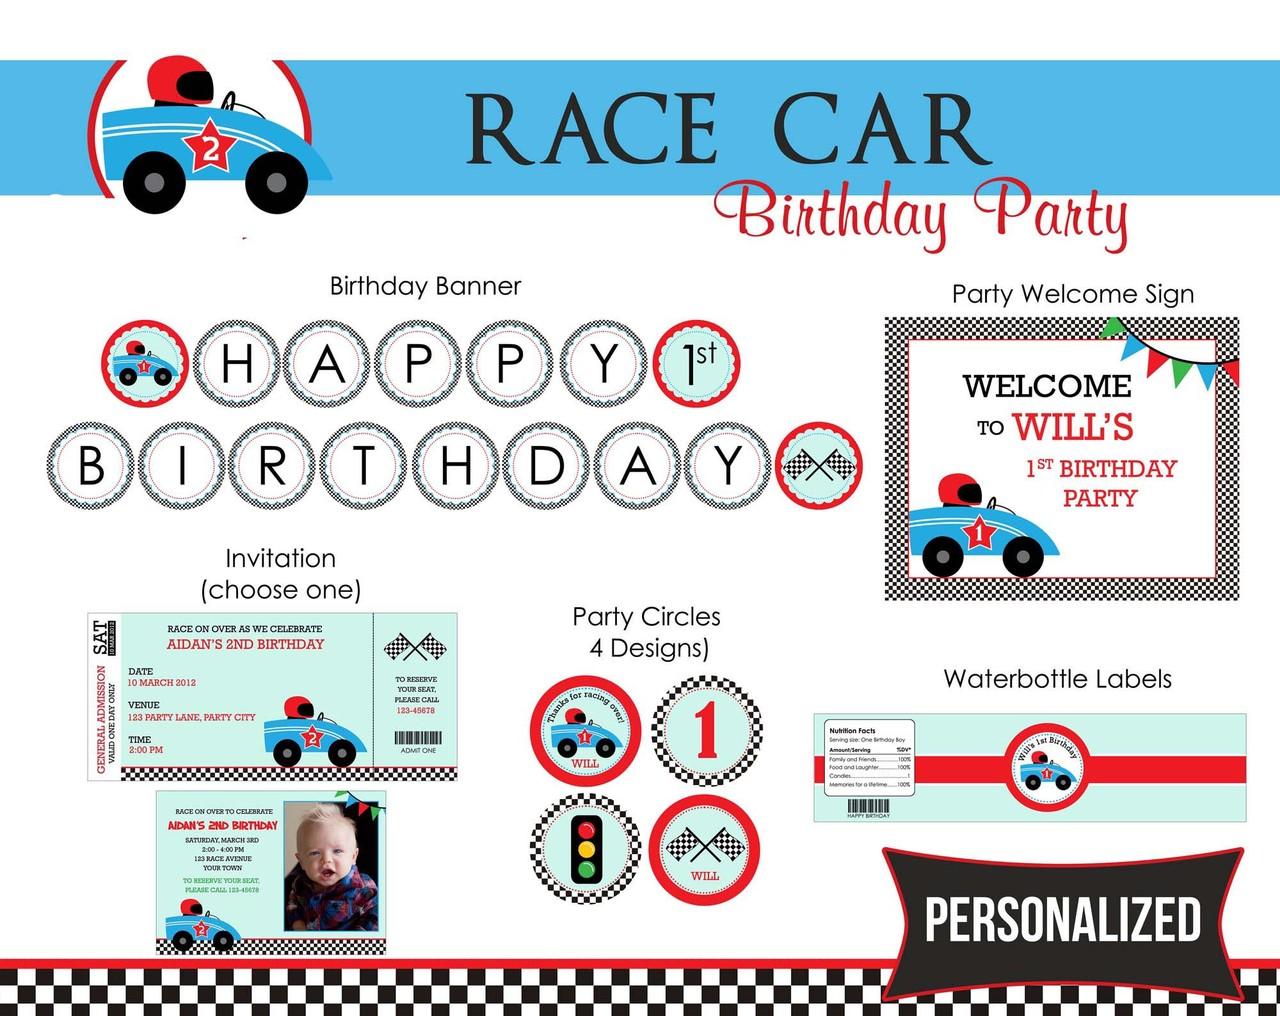 Race Car Birthday Party Package - DIY Printable – CallaChic